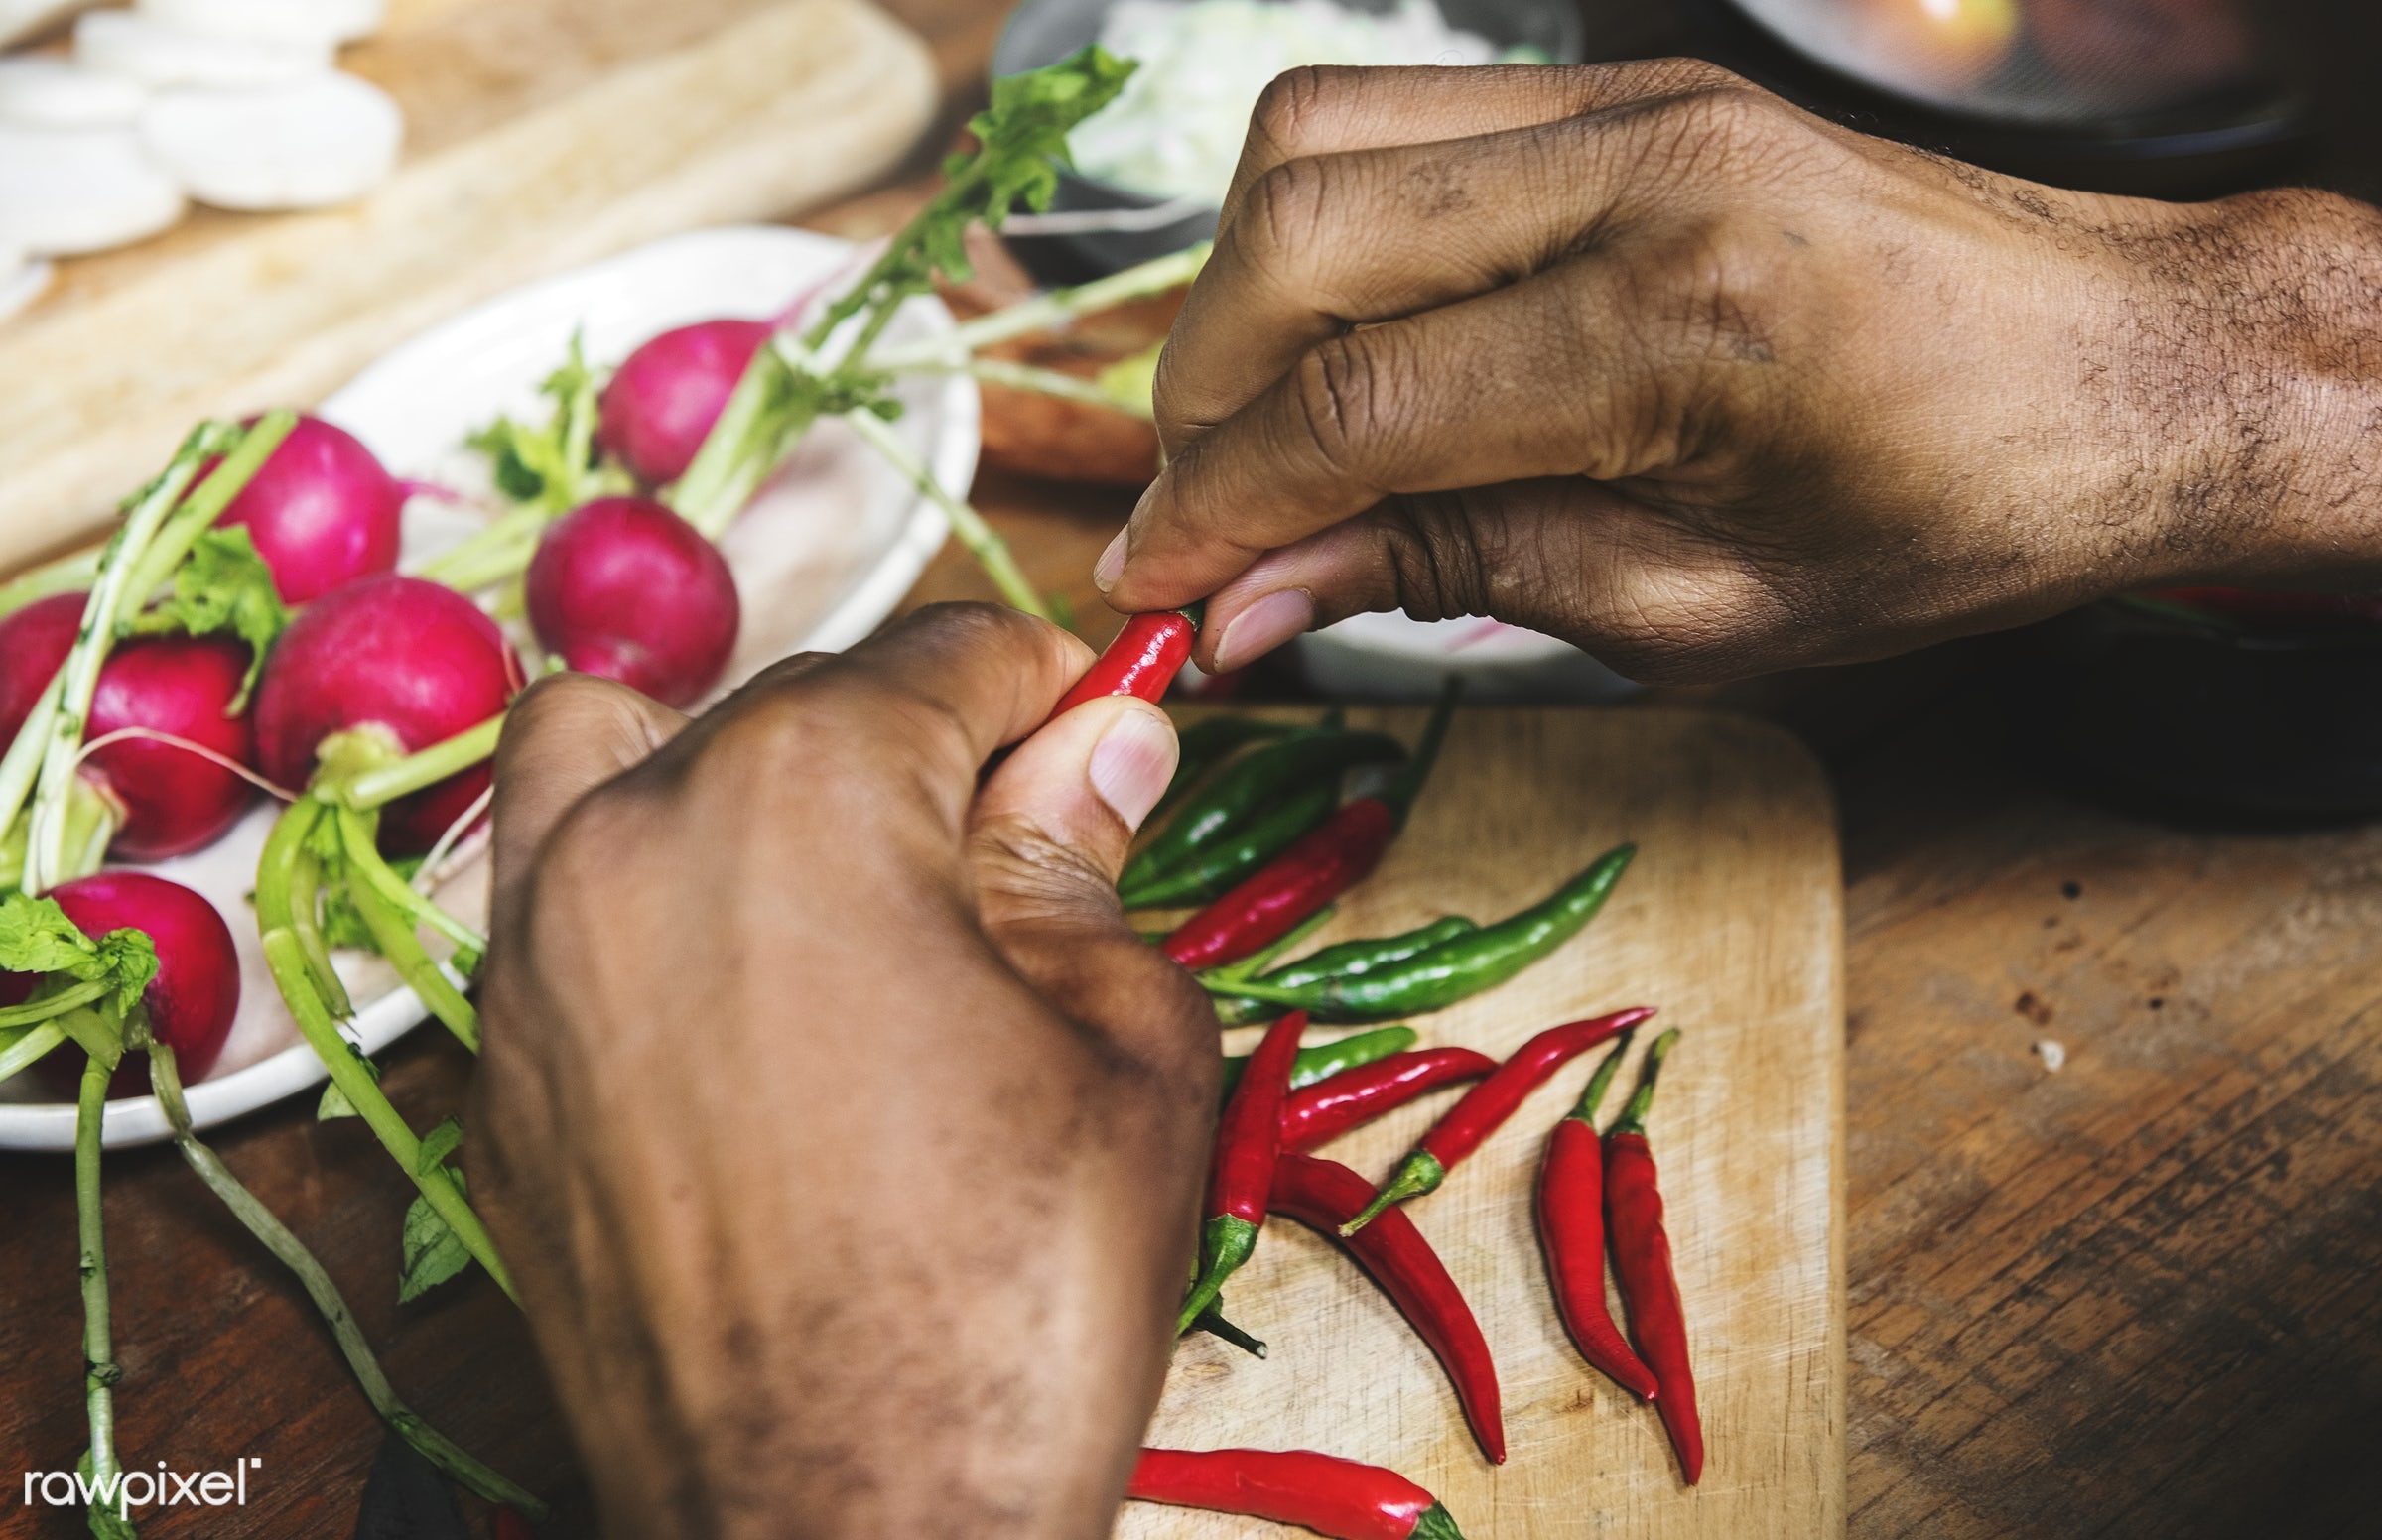 raw, diverse, chopping board, pepper, farm, ingredients, farmer, nature, fresh, hands, products, closeup, cut board,...